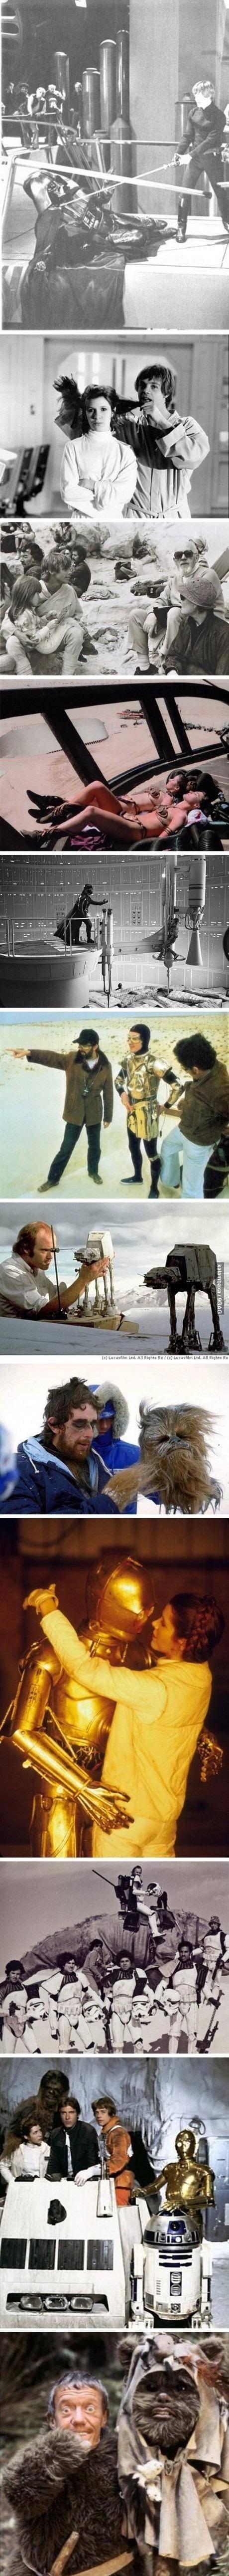 Awesome Star Wars photos. beep boop.